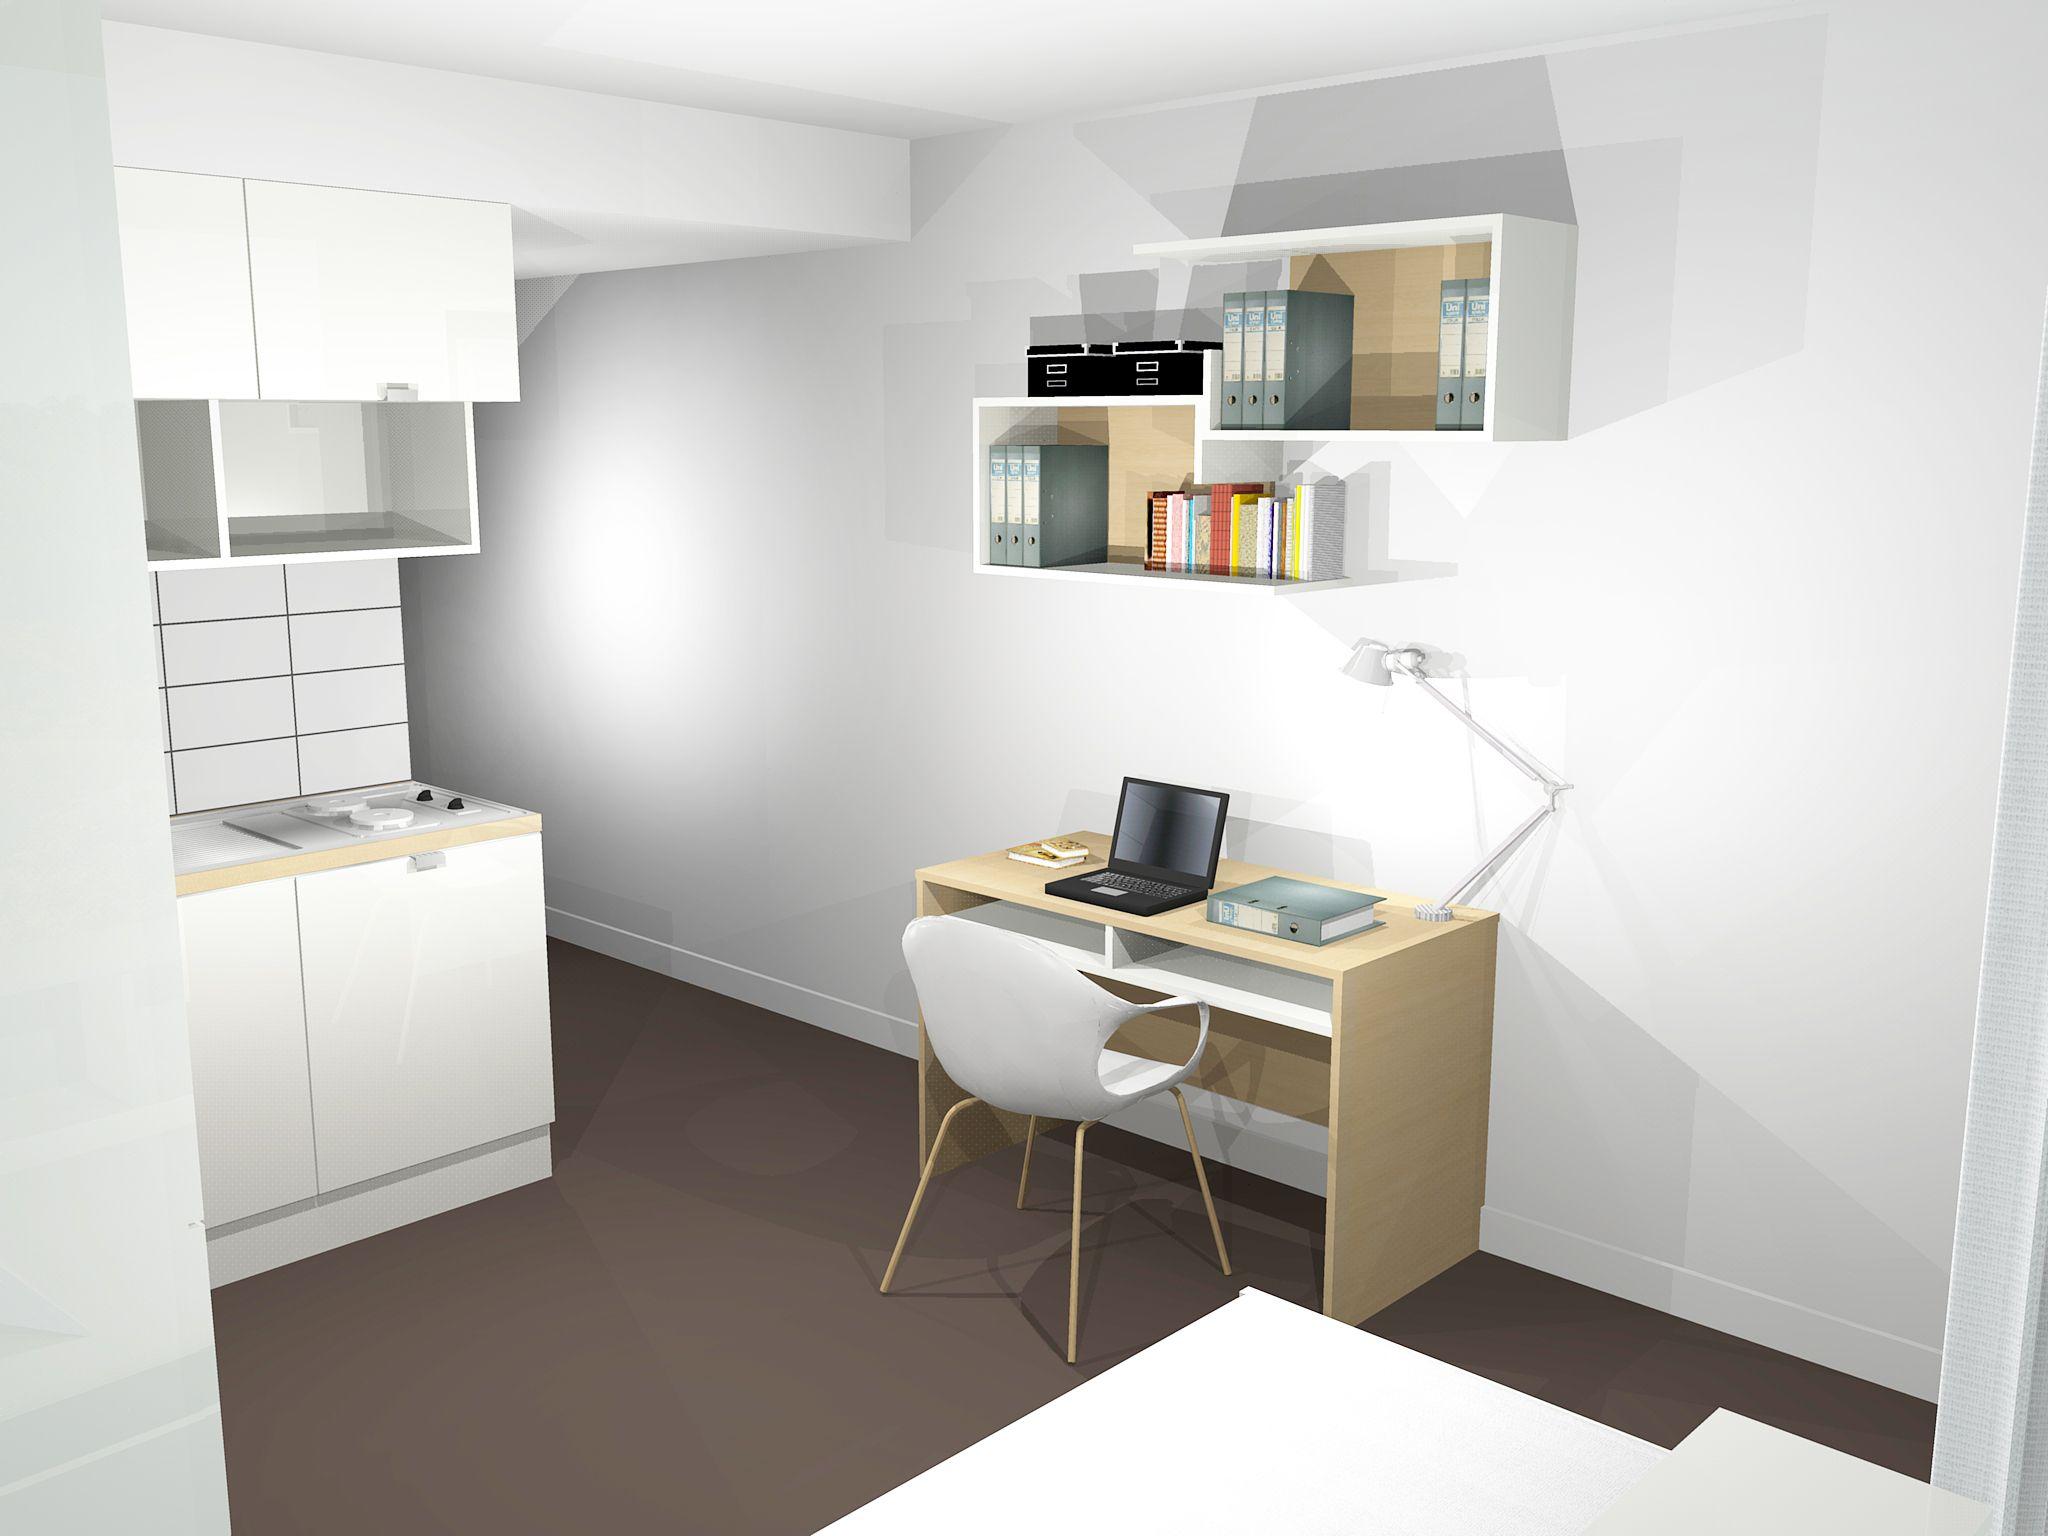 Maison universitaire internationale strasbourg maison - Logement etudiant strasbourg meuble ...